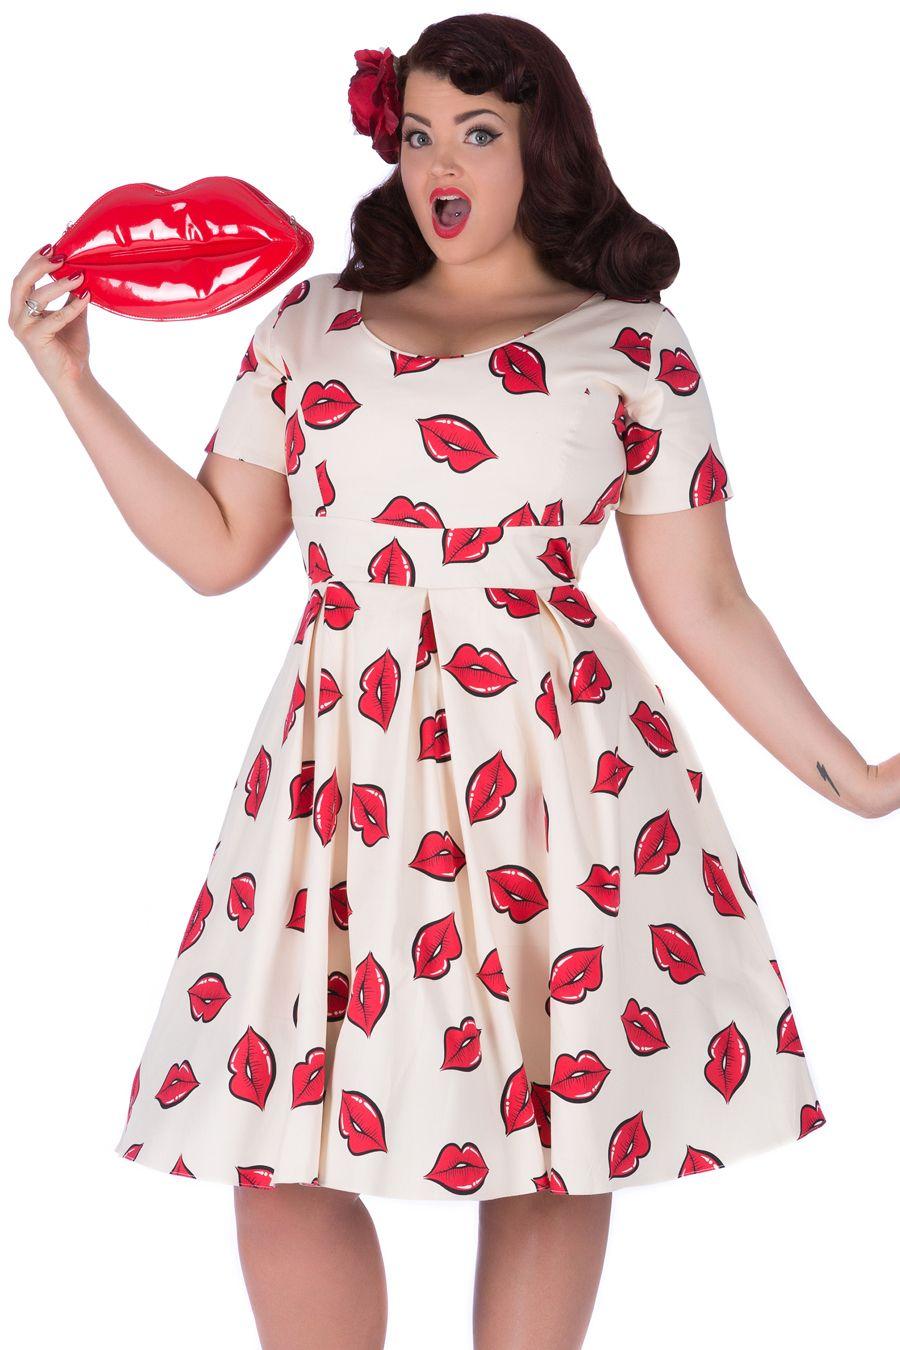 Size 18 50s style dress